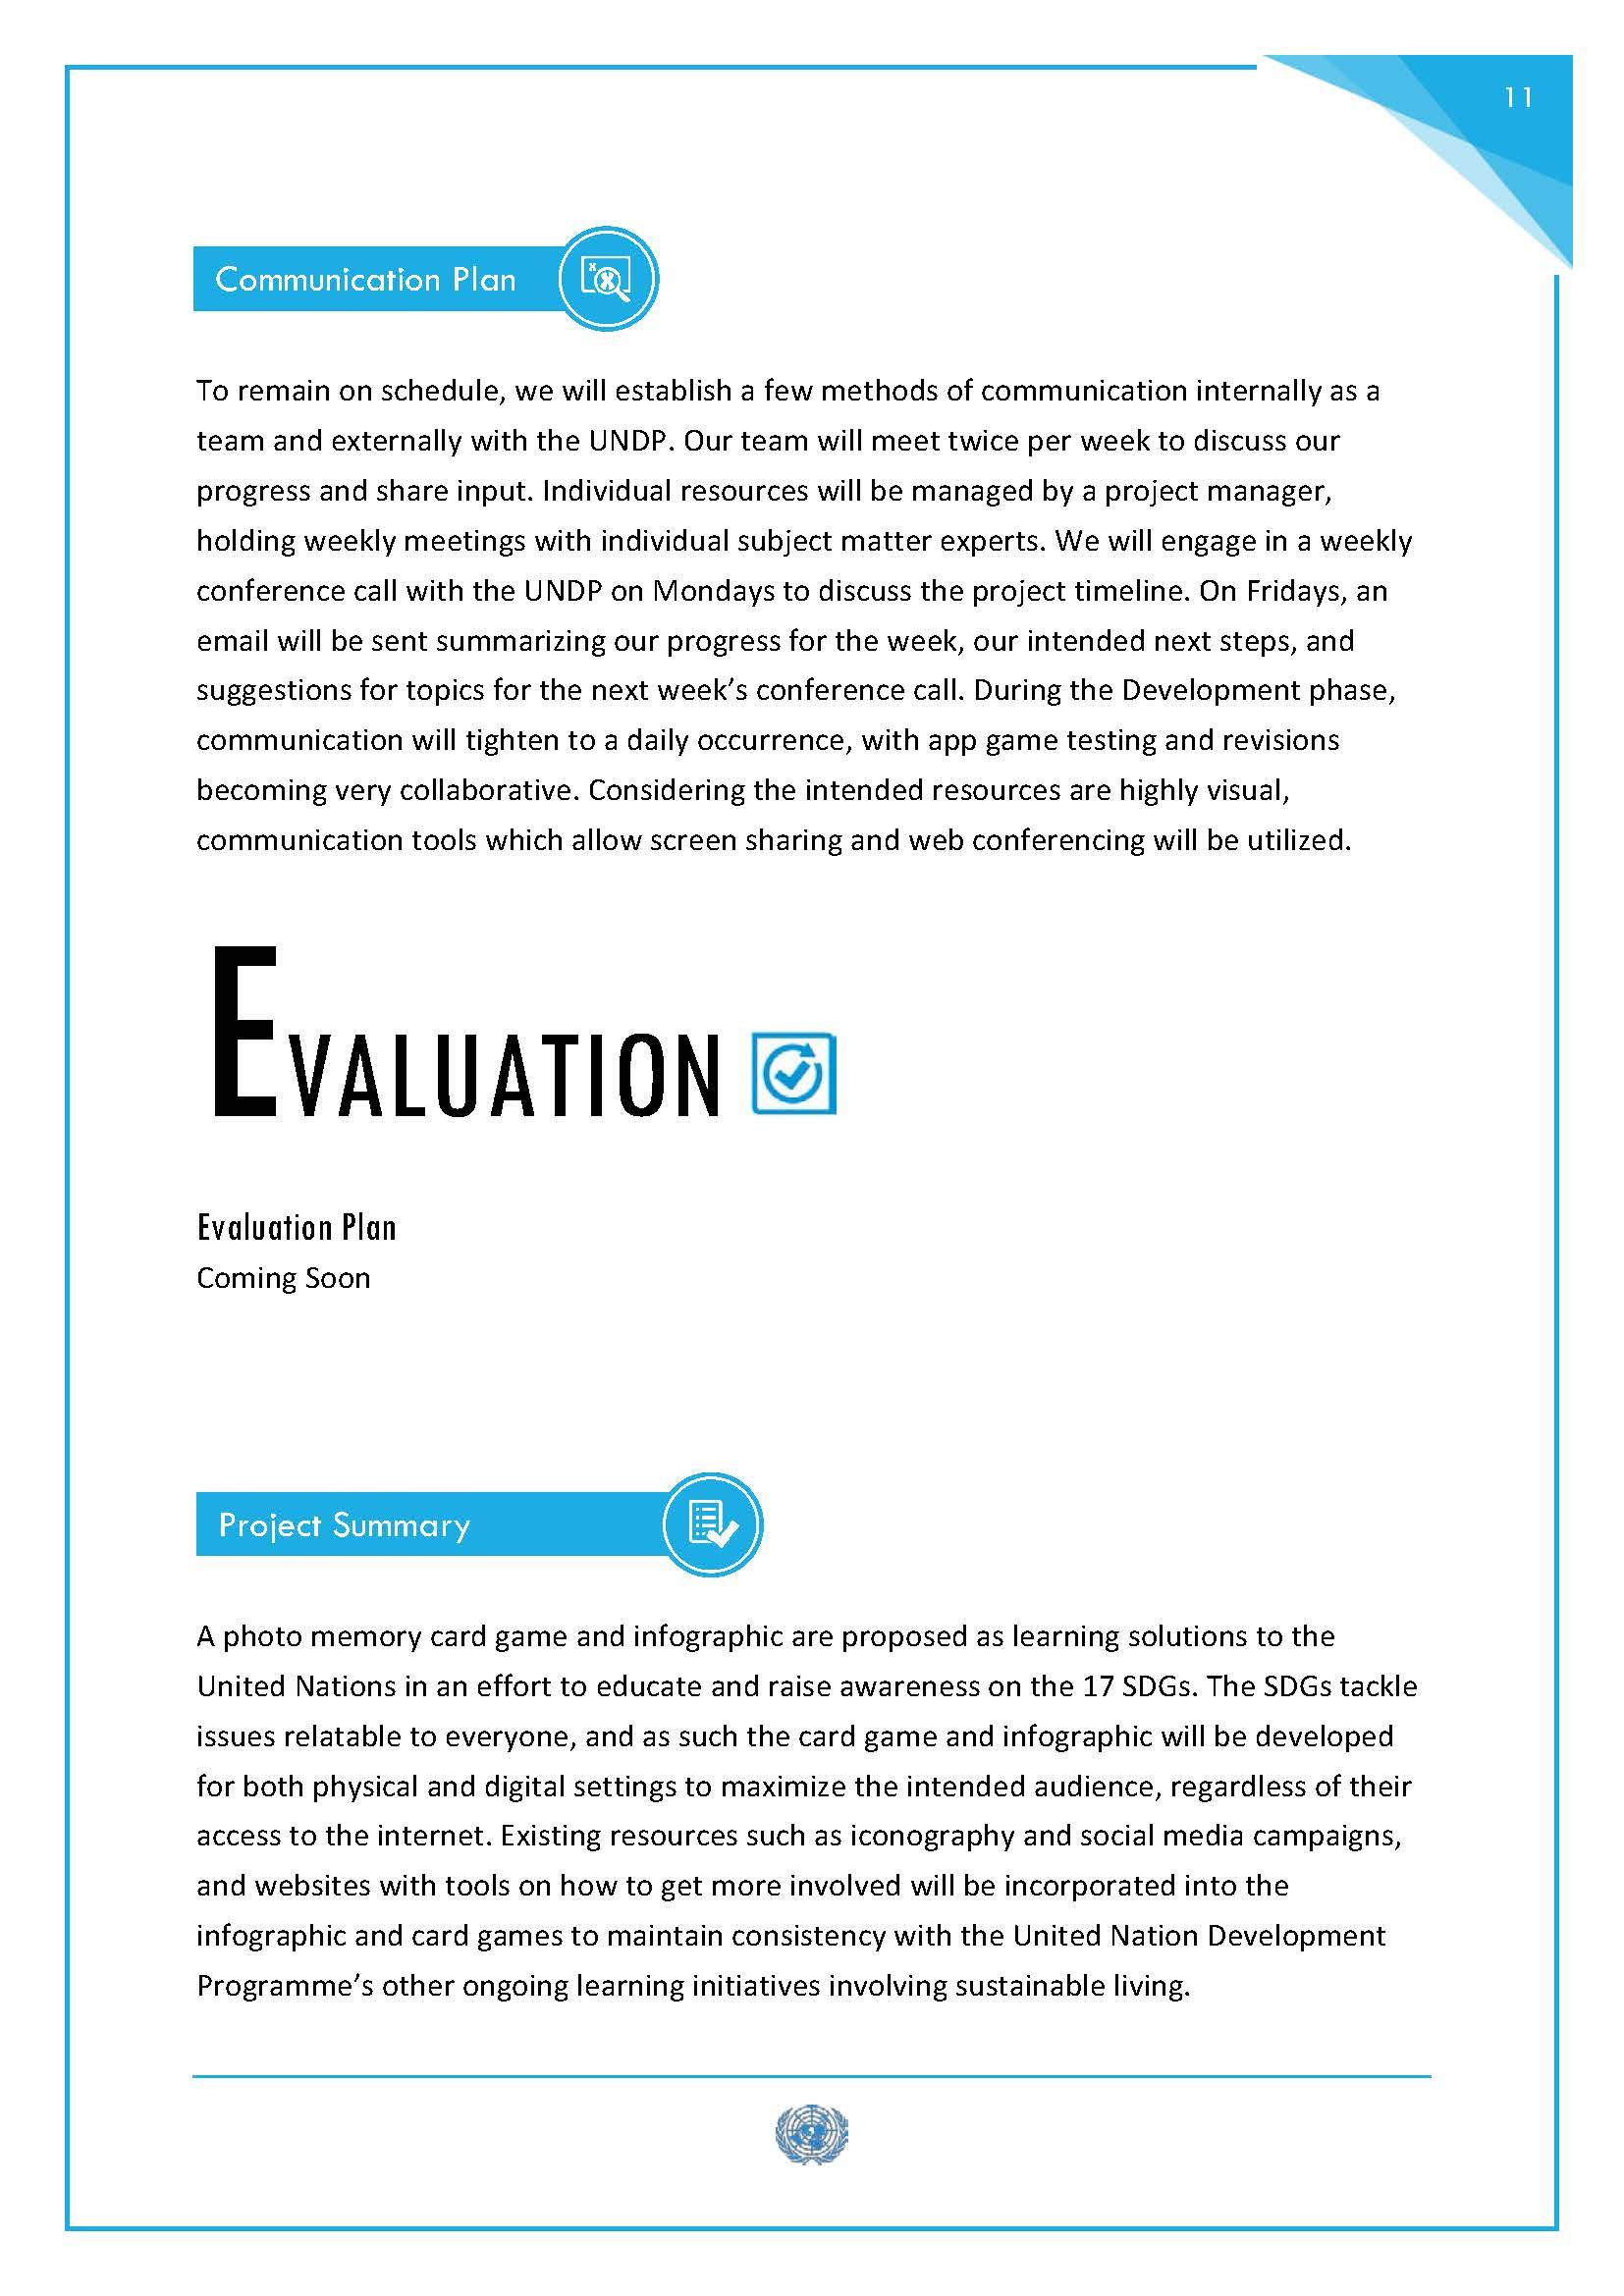 Design Document_Kraus&Beatty_Page_12.jpg